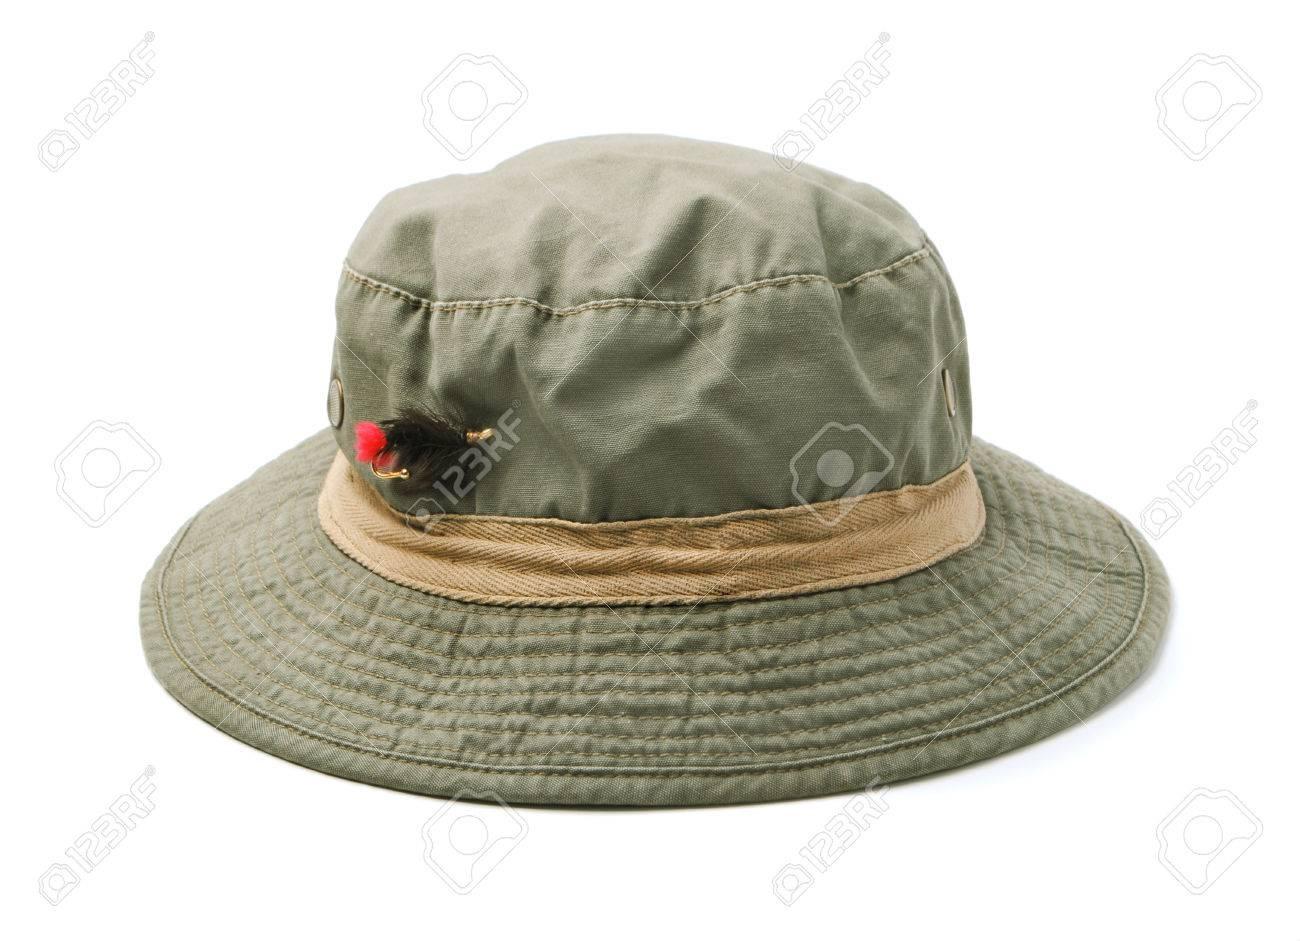 Fly Fishing Bucket Hat